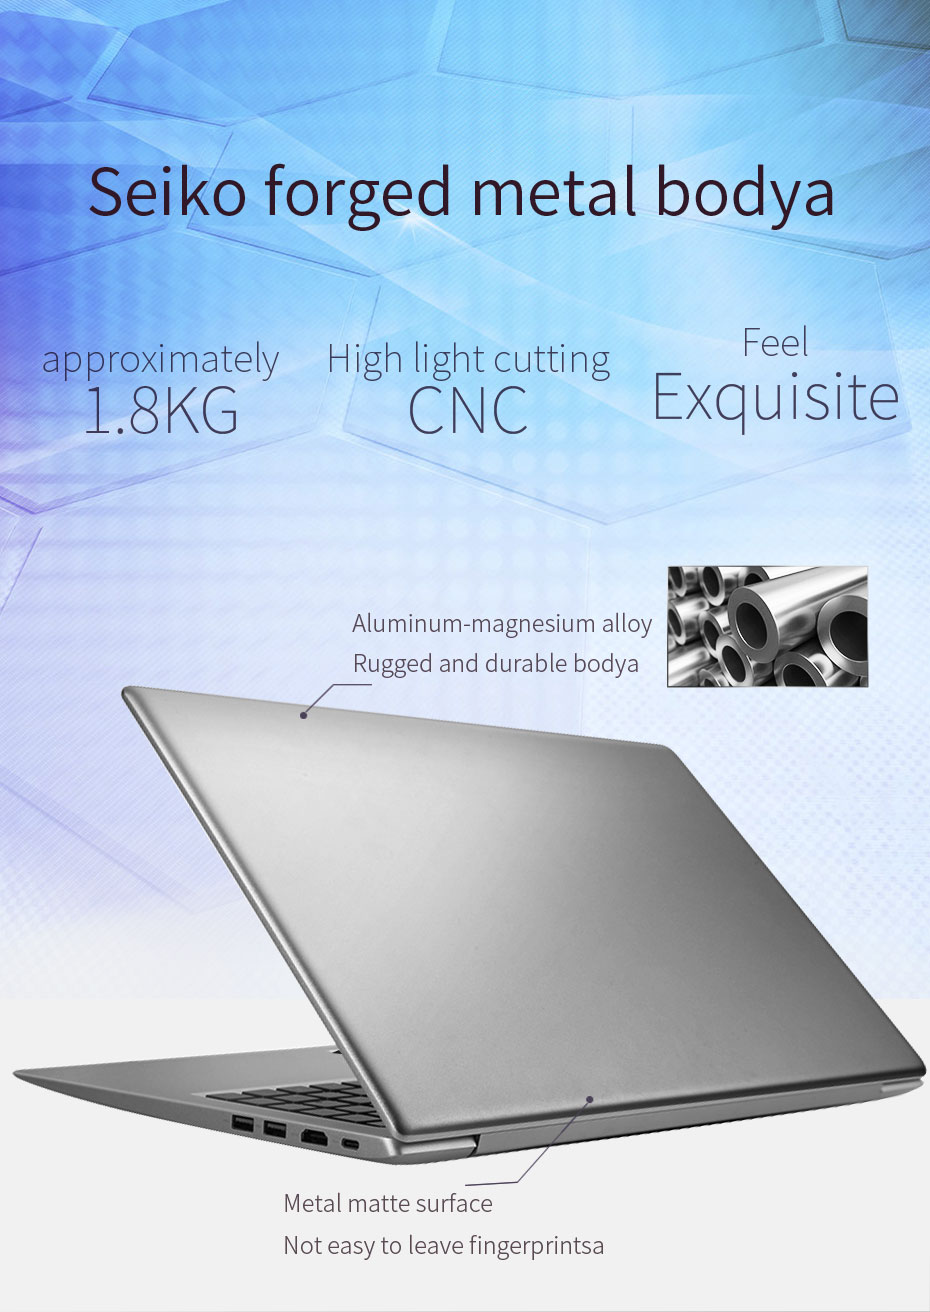 SSD كمبيوتر Sidra P10 12